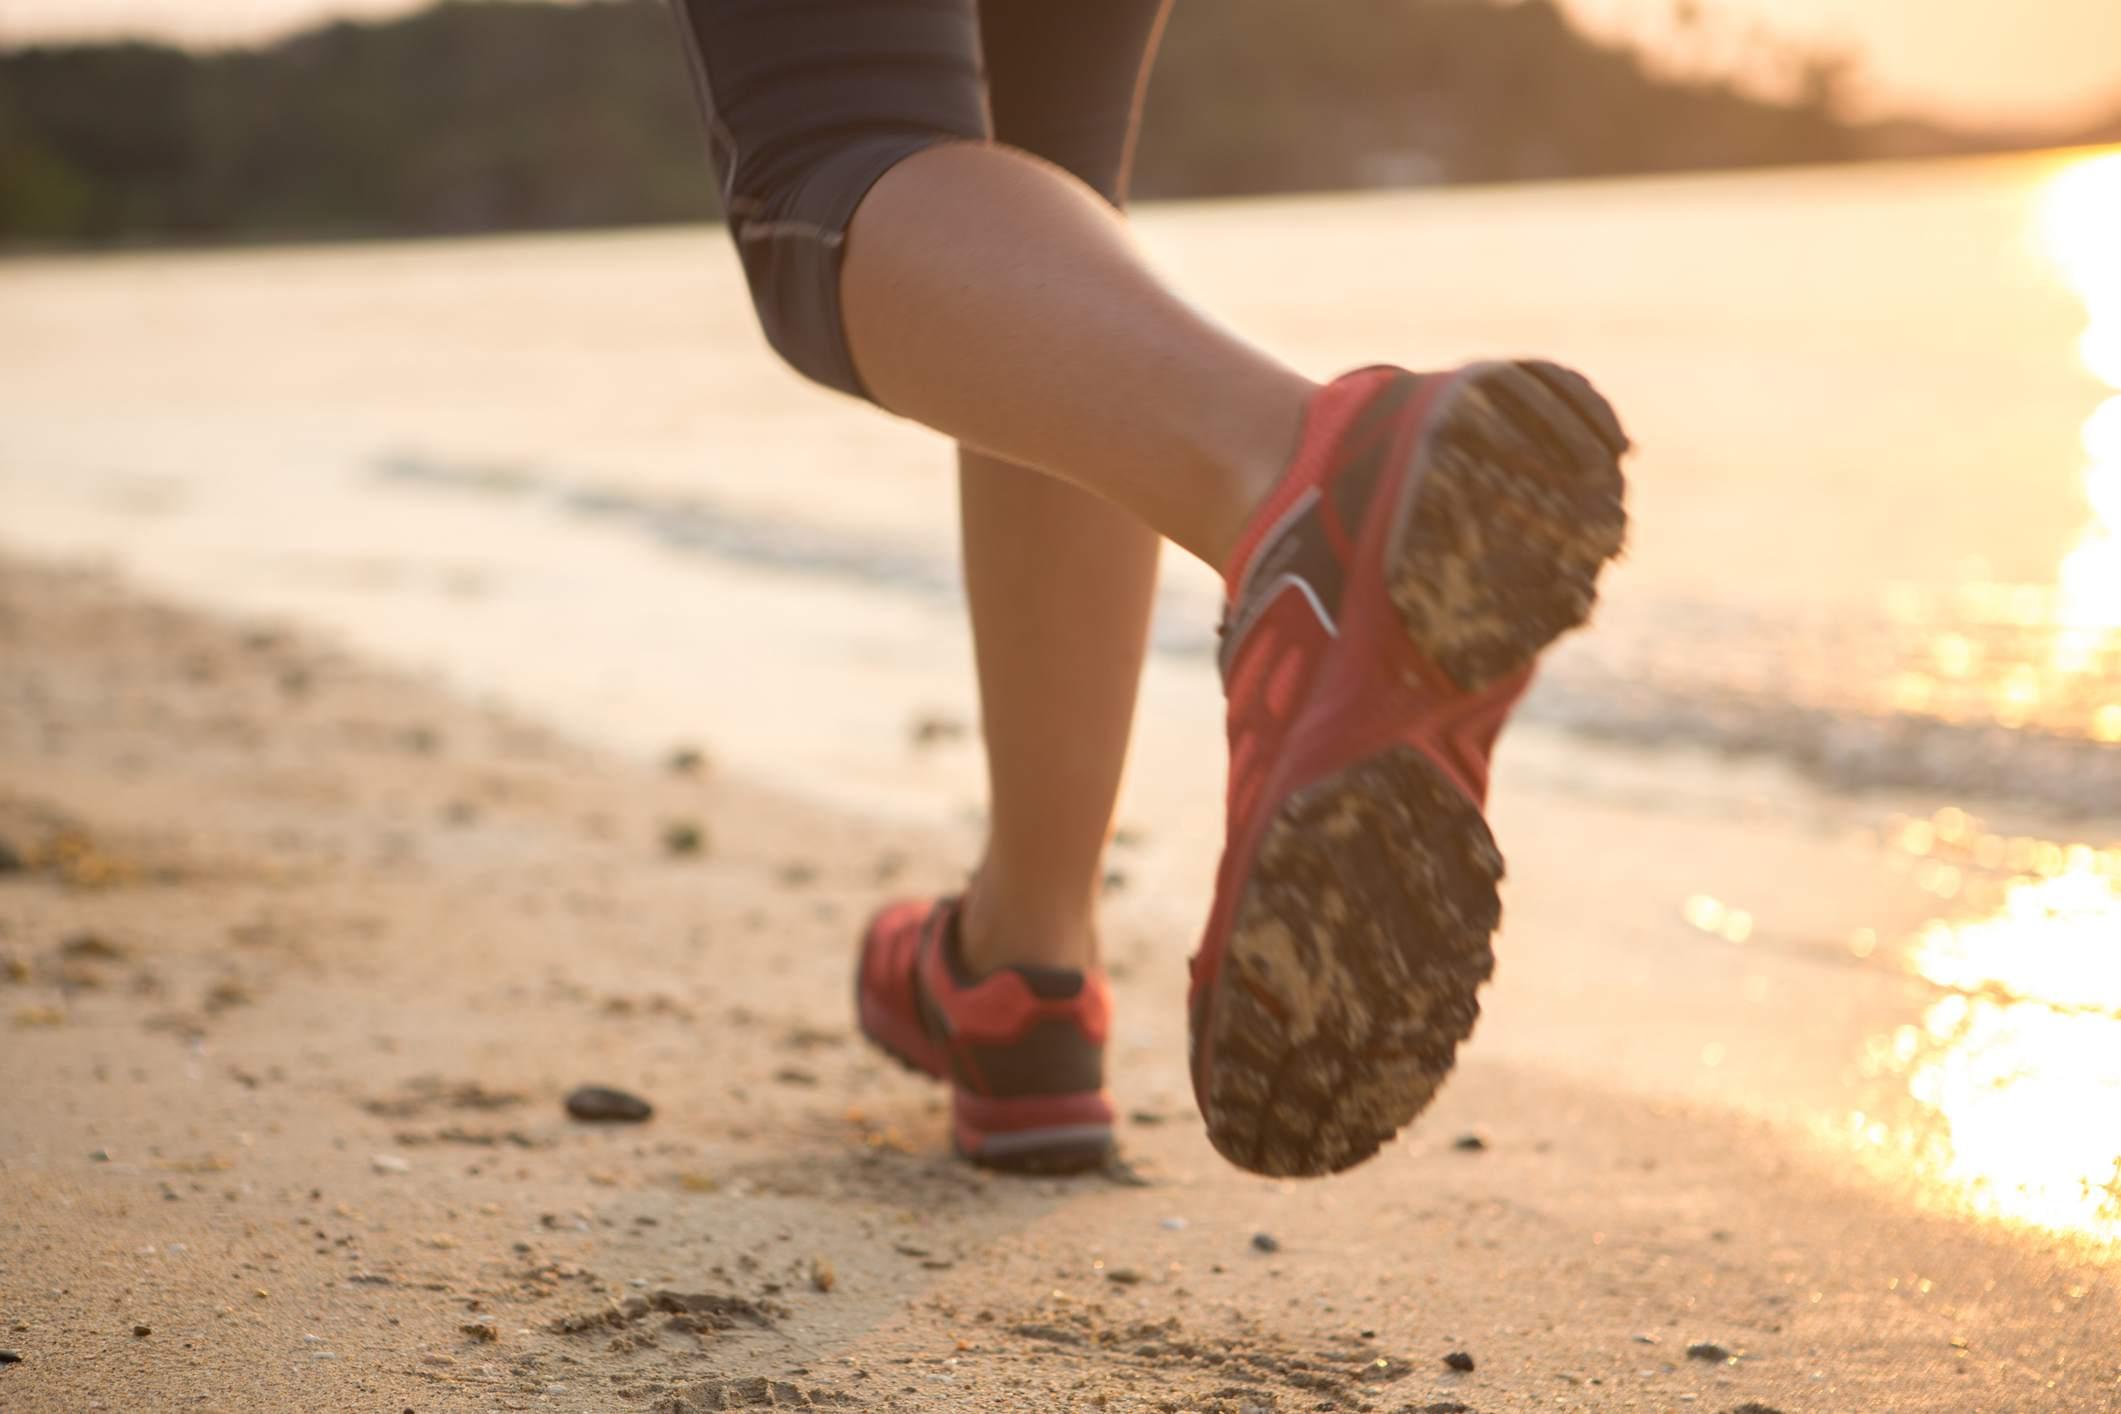 Running on the beach at sunset